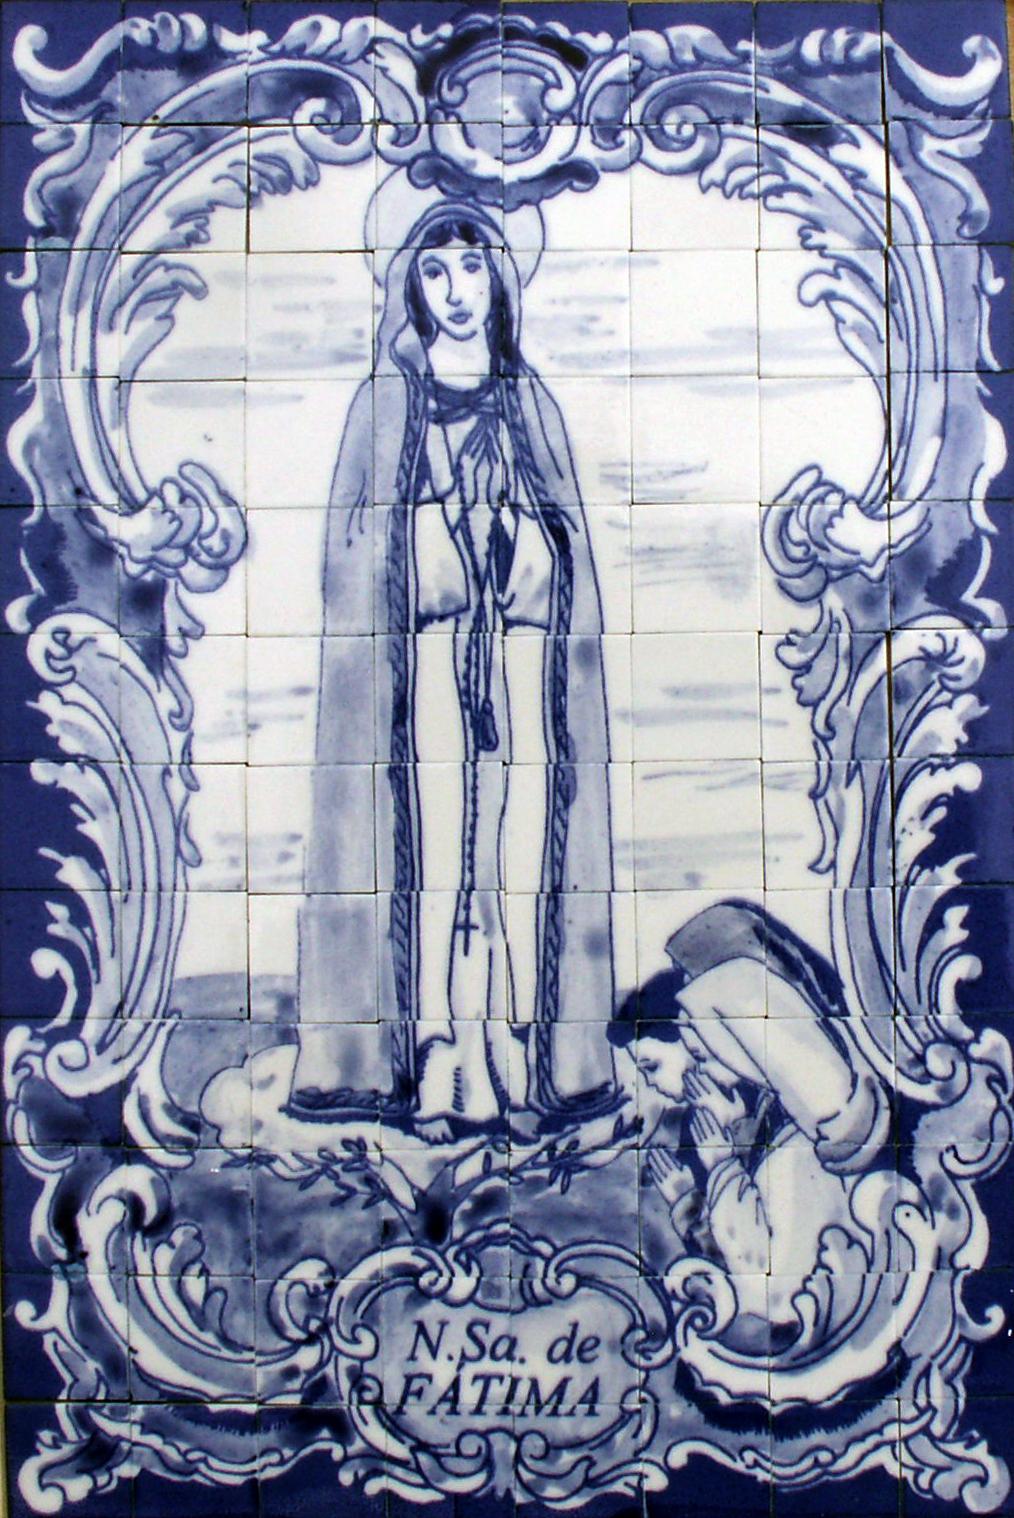 Panneau de Notre-Dame de FATIMA